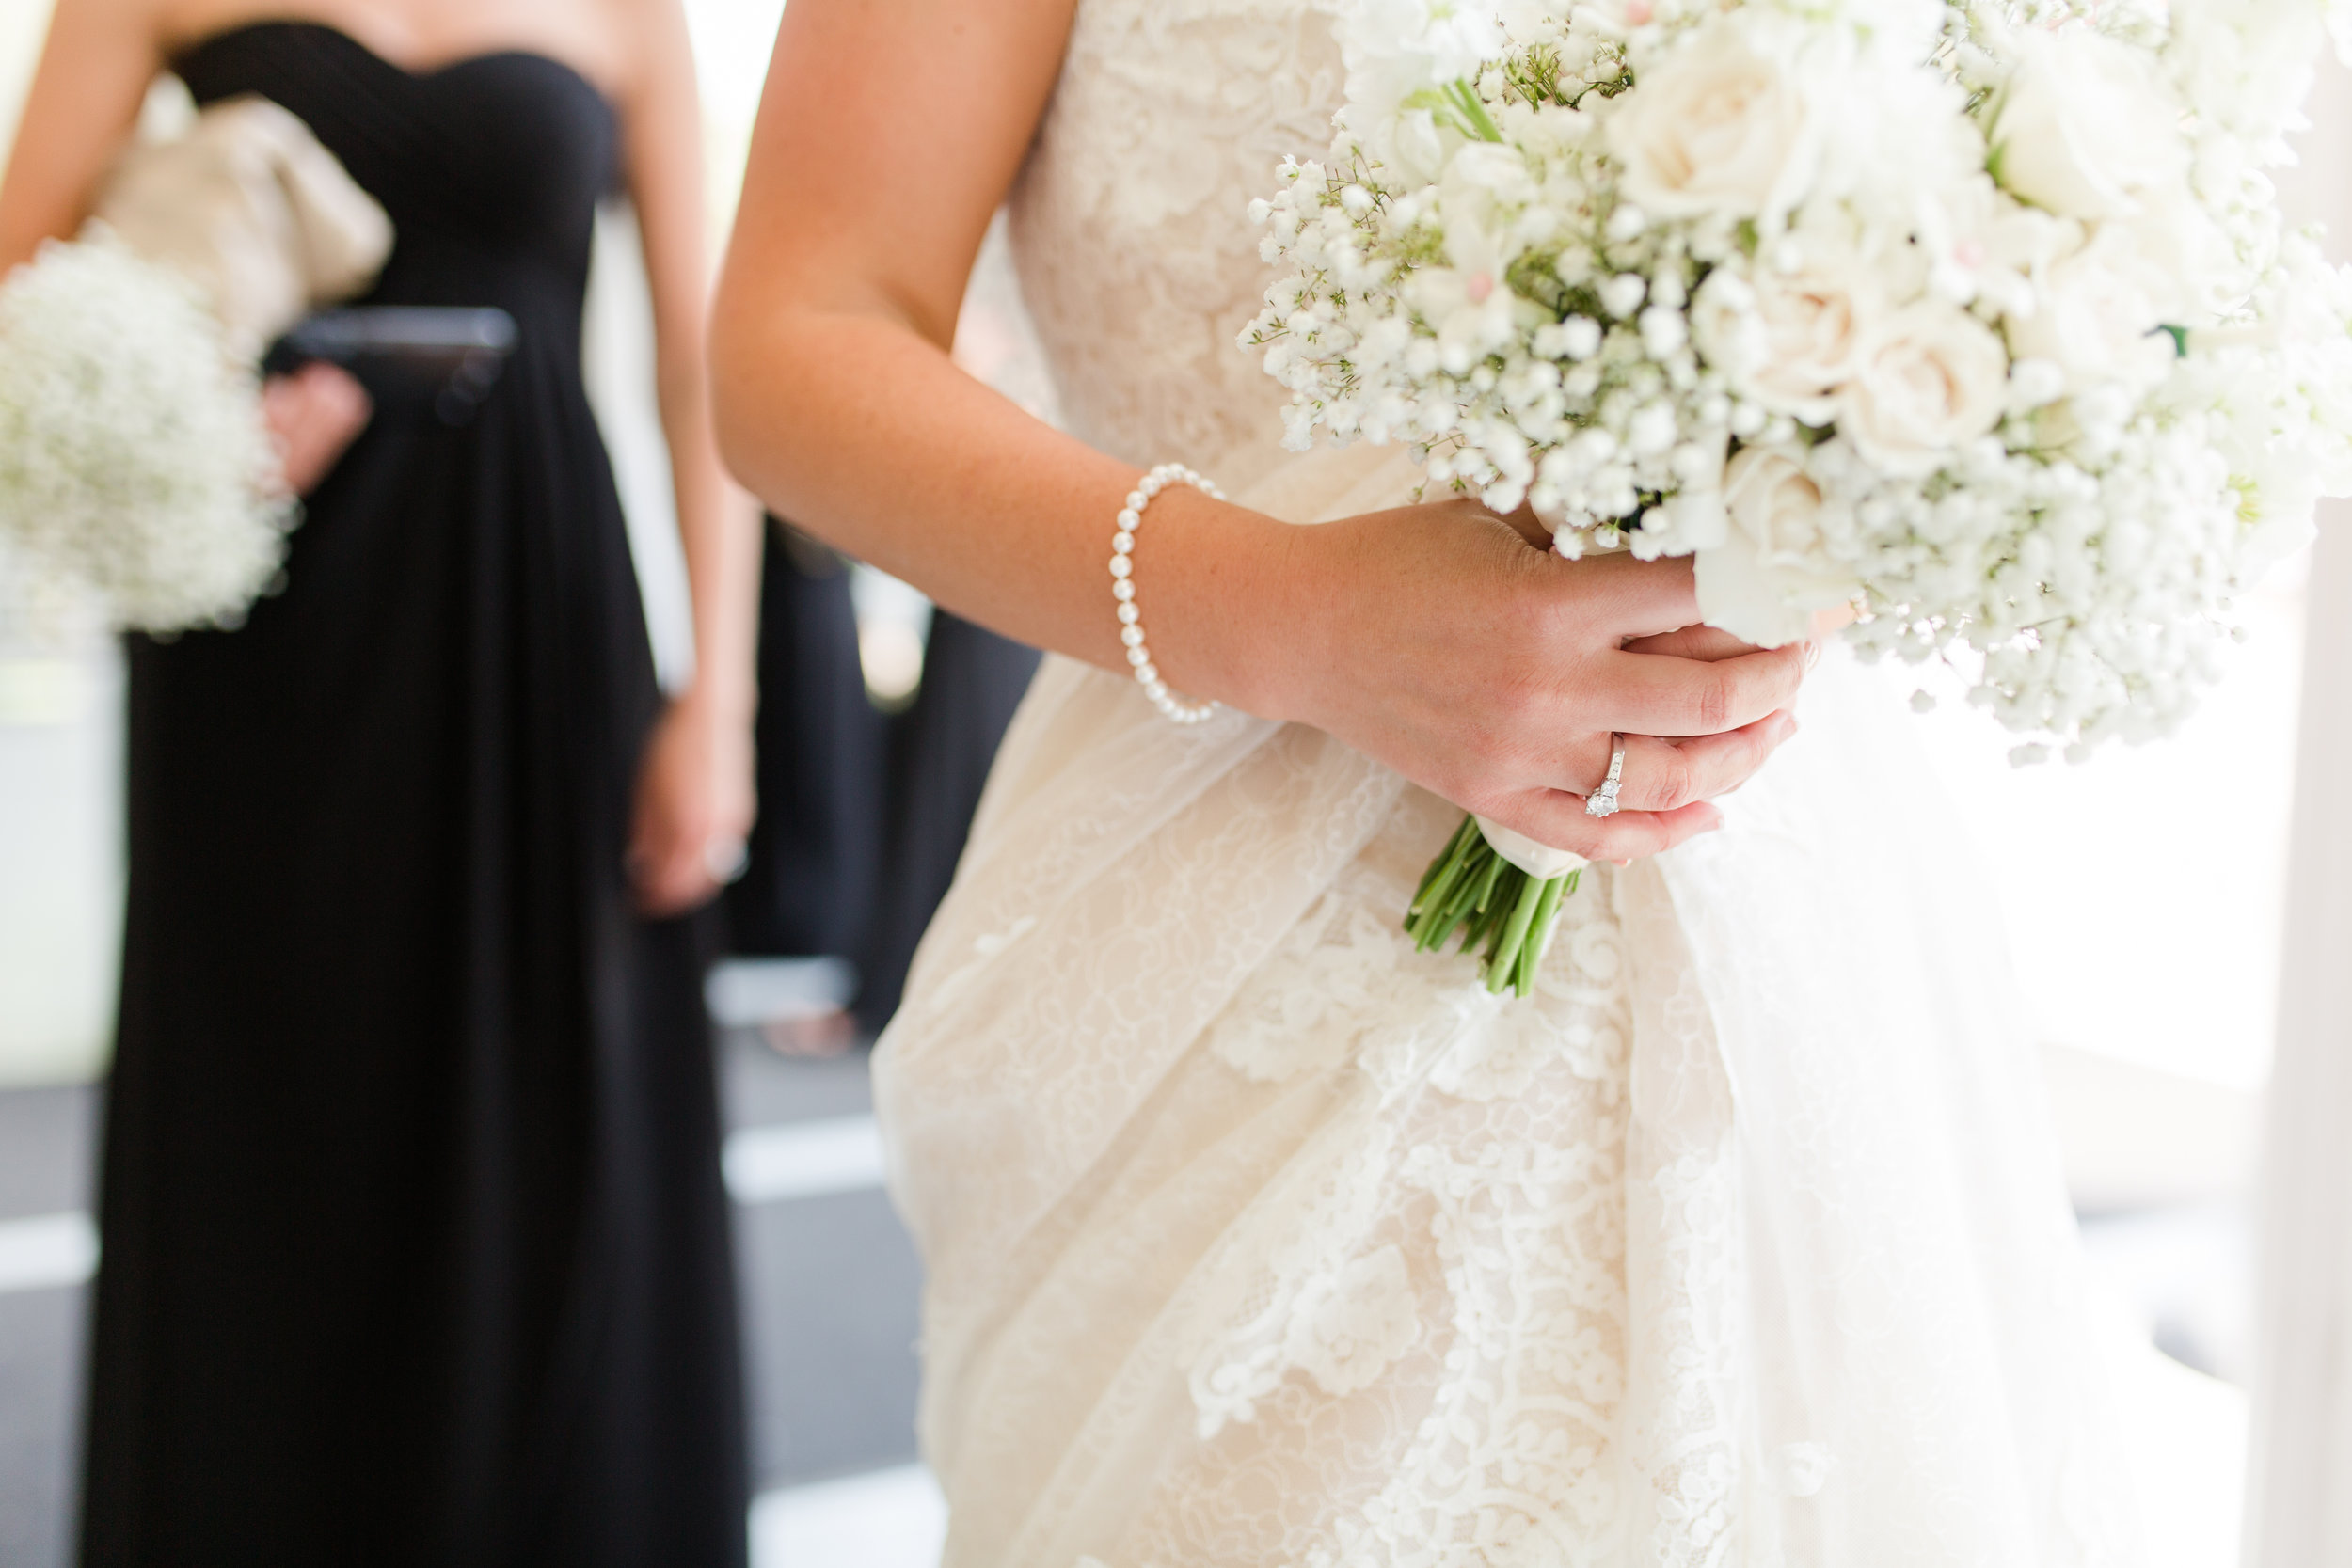 bridals and bridal party-6.jpg